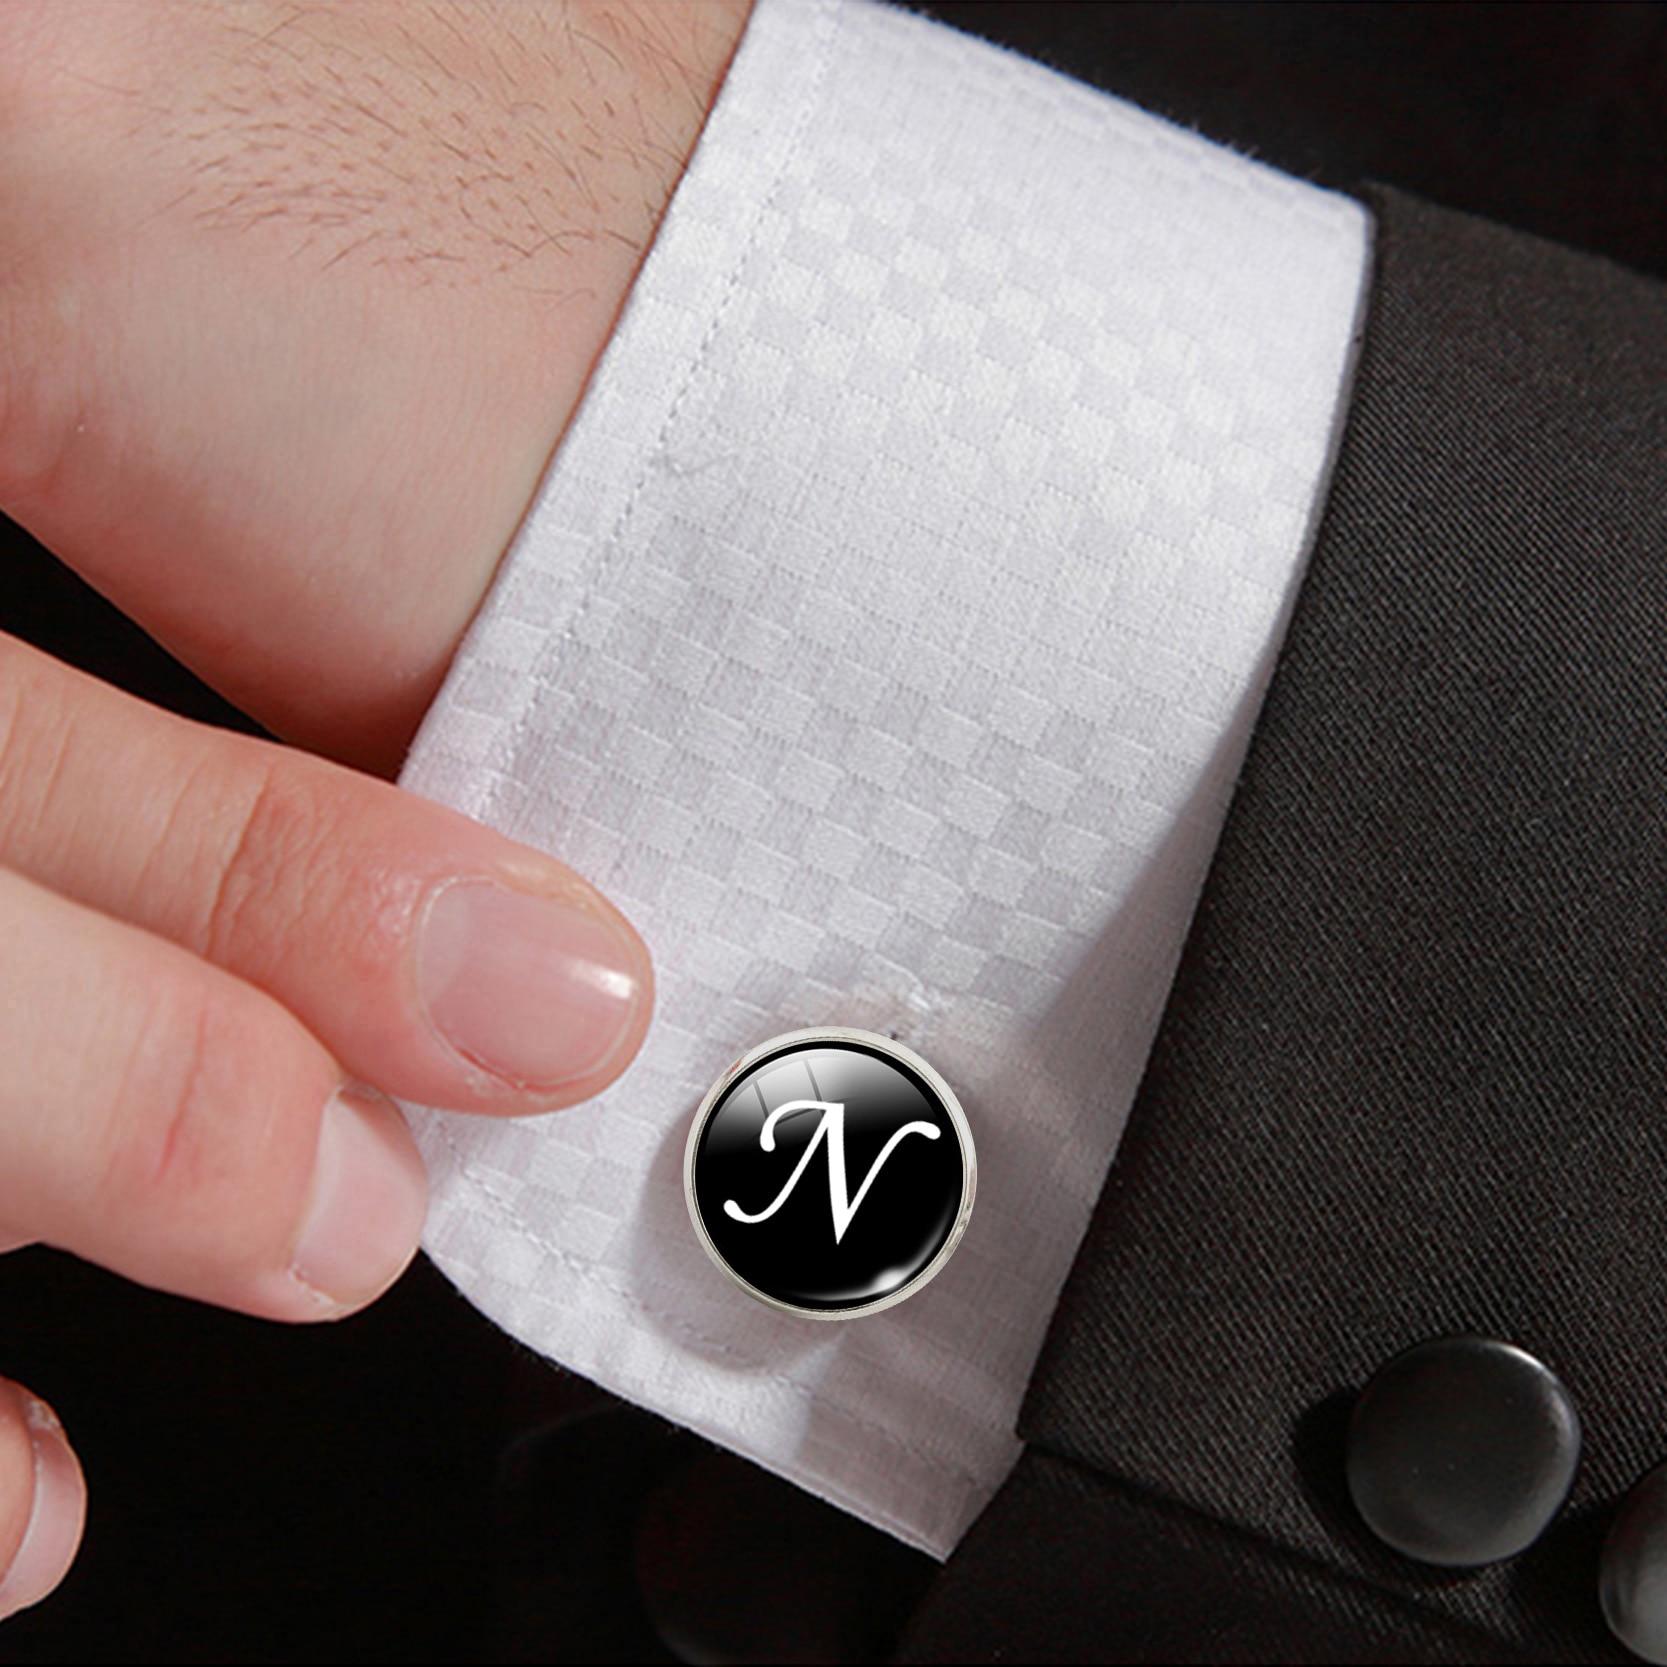 N-Z Initial Alphabet Silver Color Letter Men Cufflinks High Quality Cuff Buttons Wedding Male Business Shirts Cufflink